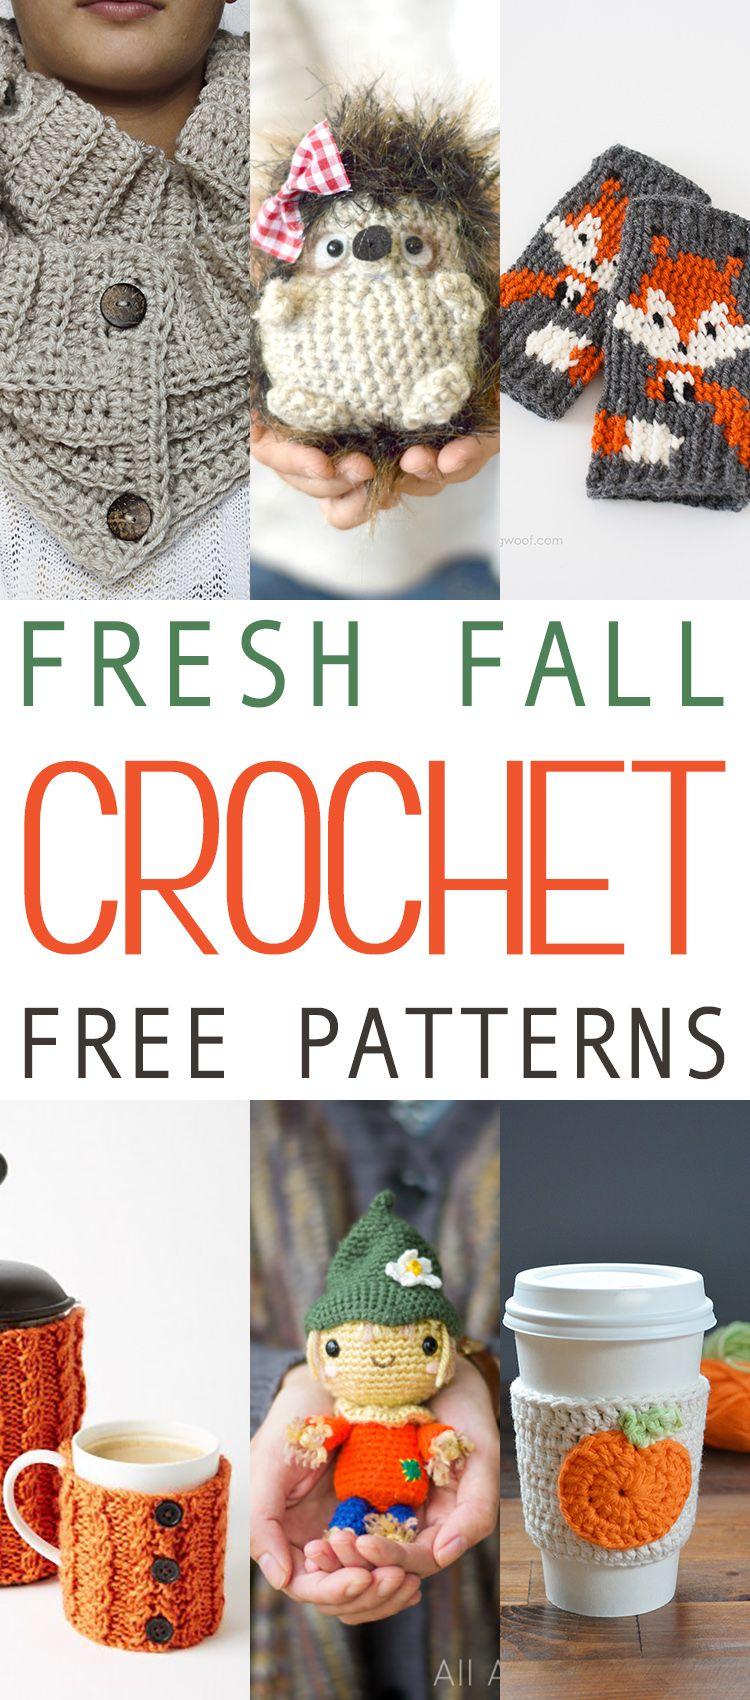 15 Fresh Fall Free Crochet Patterns | Tejido, La casa de mis sueños ...